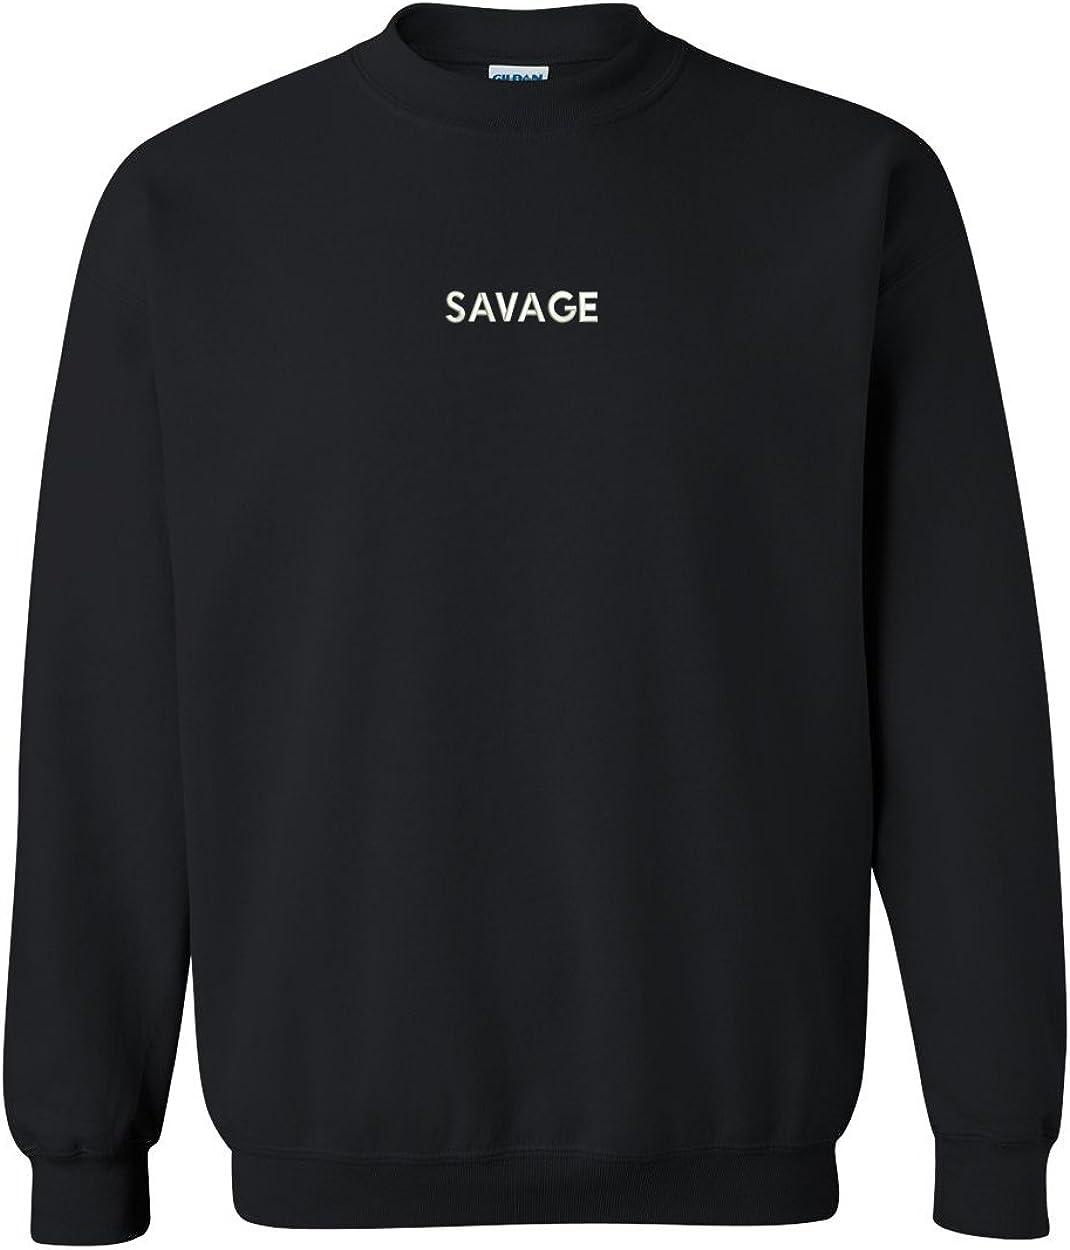 Trendy Apparel Shop Savage Embroidered Crewneck Sweatshirt